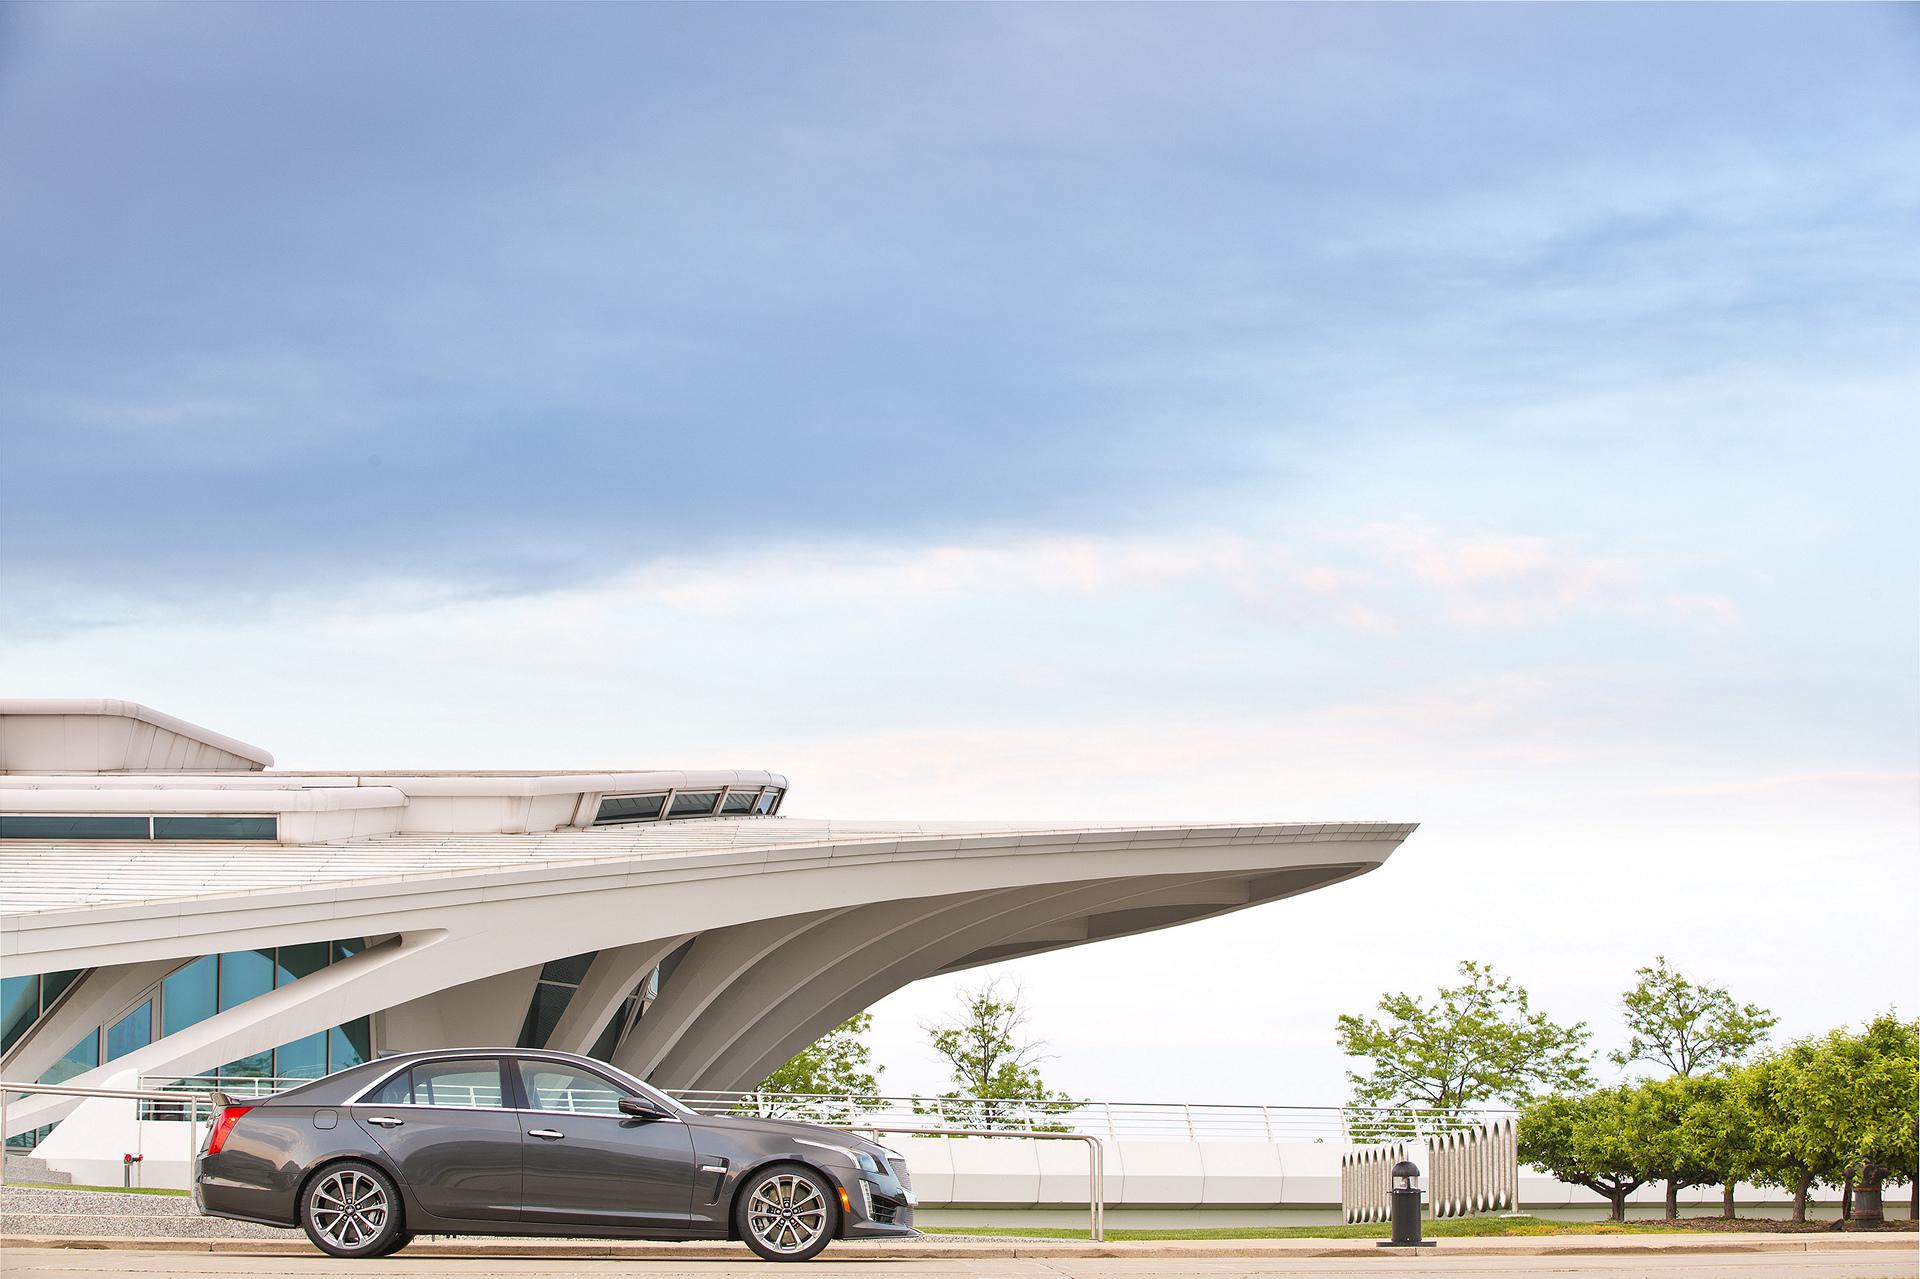 2016 Cadillac CTS-V Sedan Review - Carrrs Auto Portal